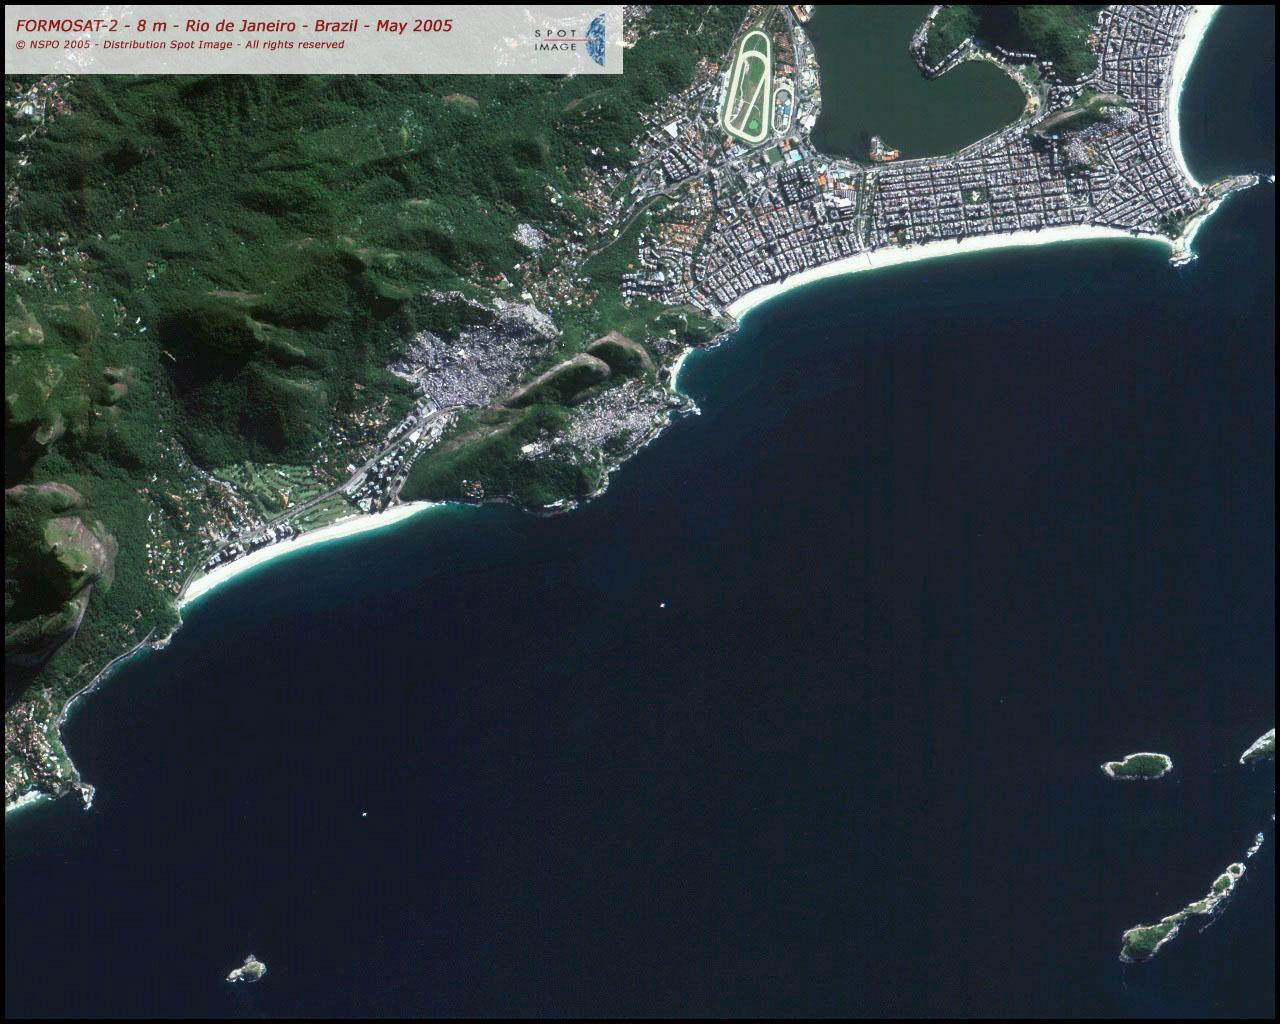 FORMOSAT 2 Satellite Image Of Rio De Janeiro